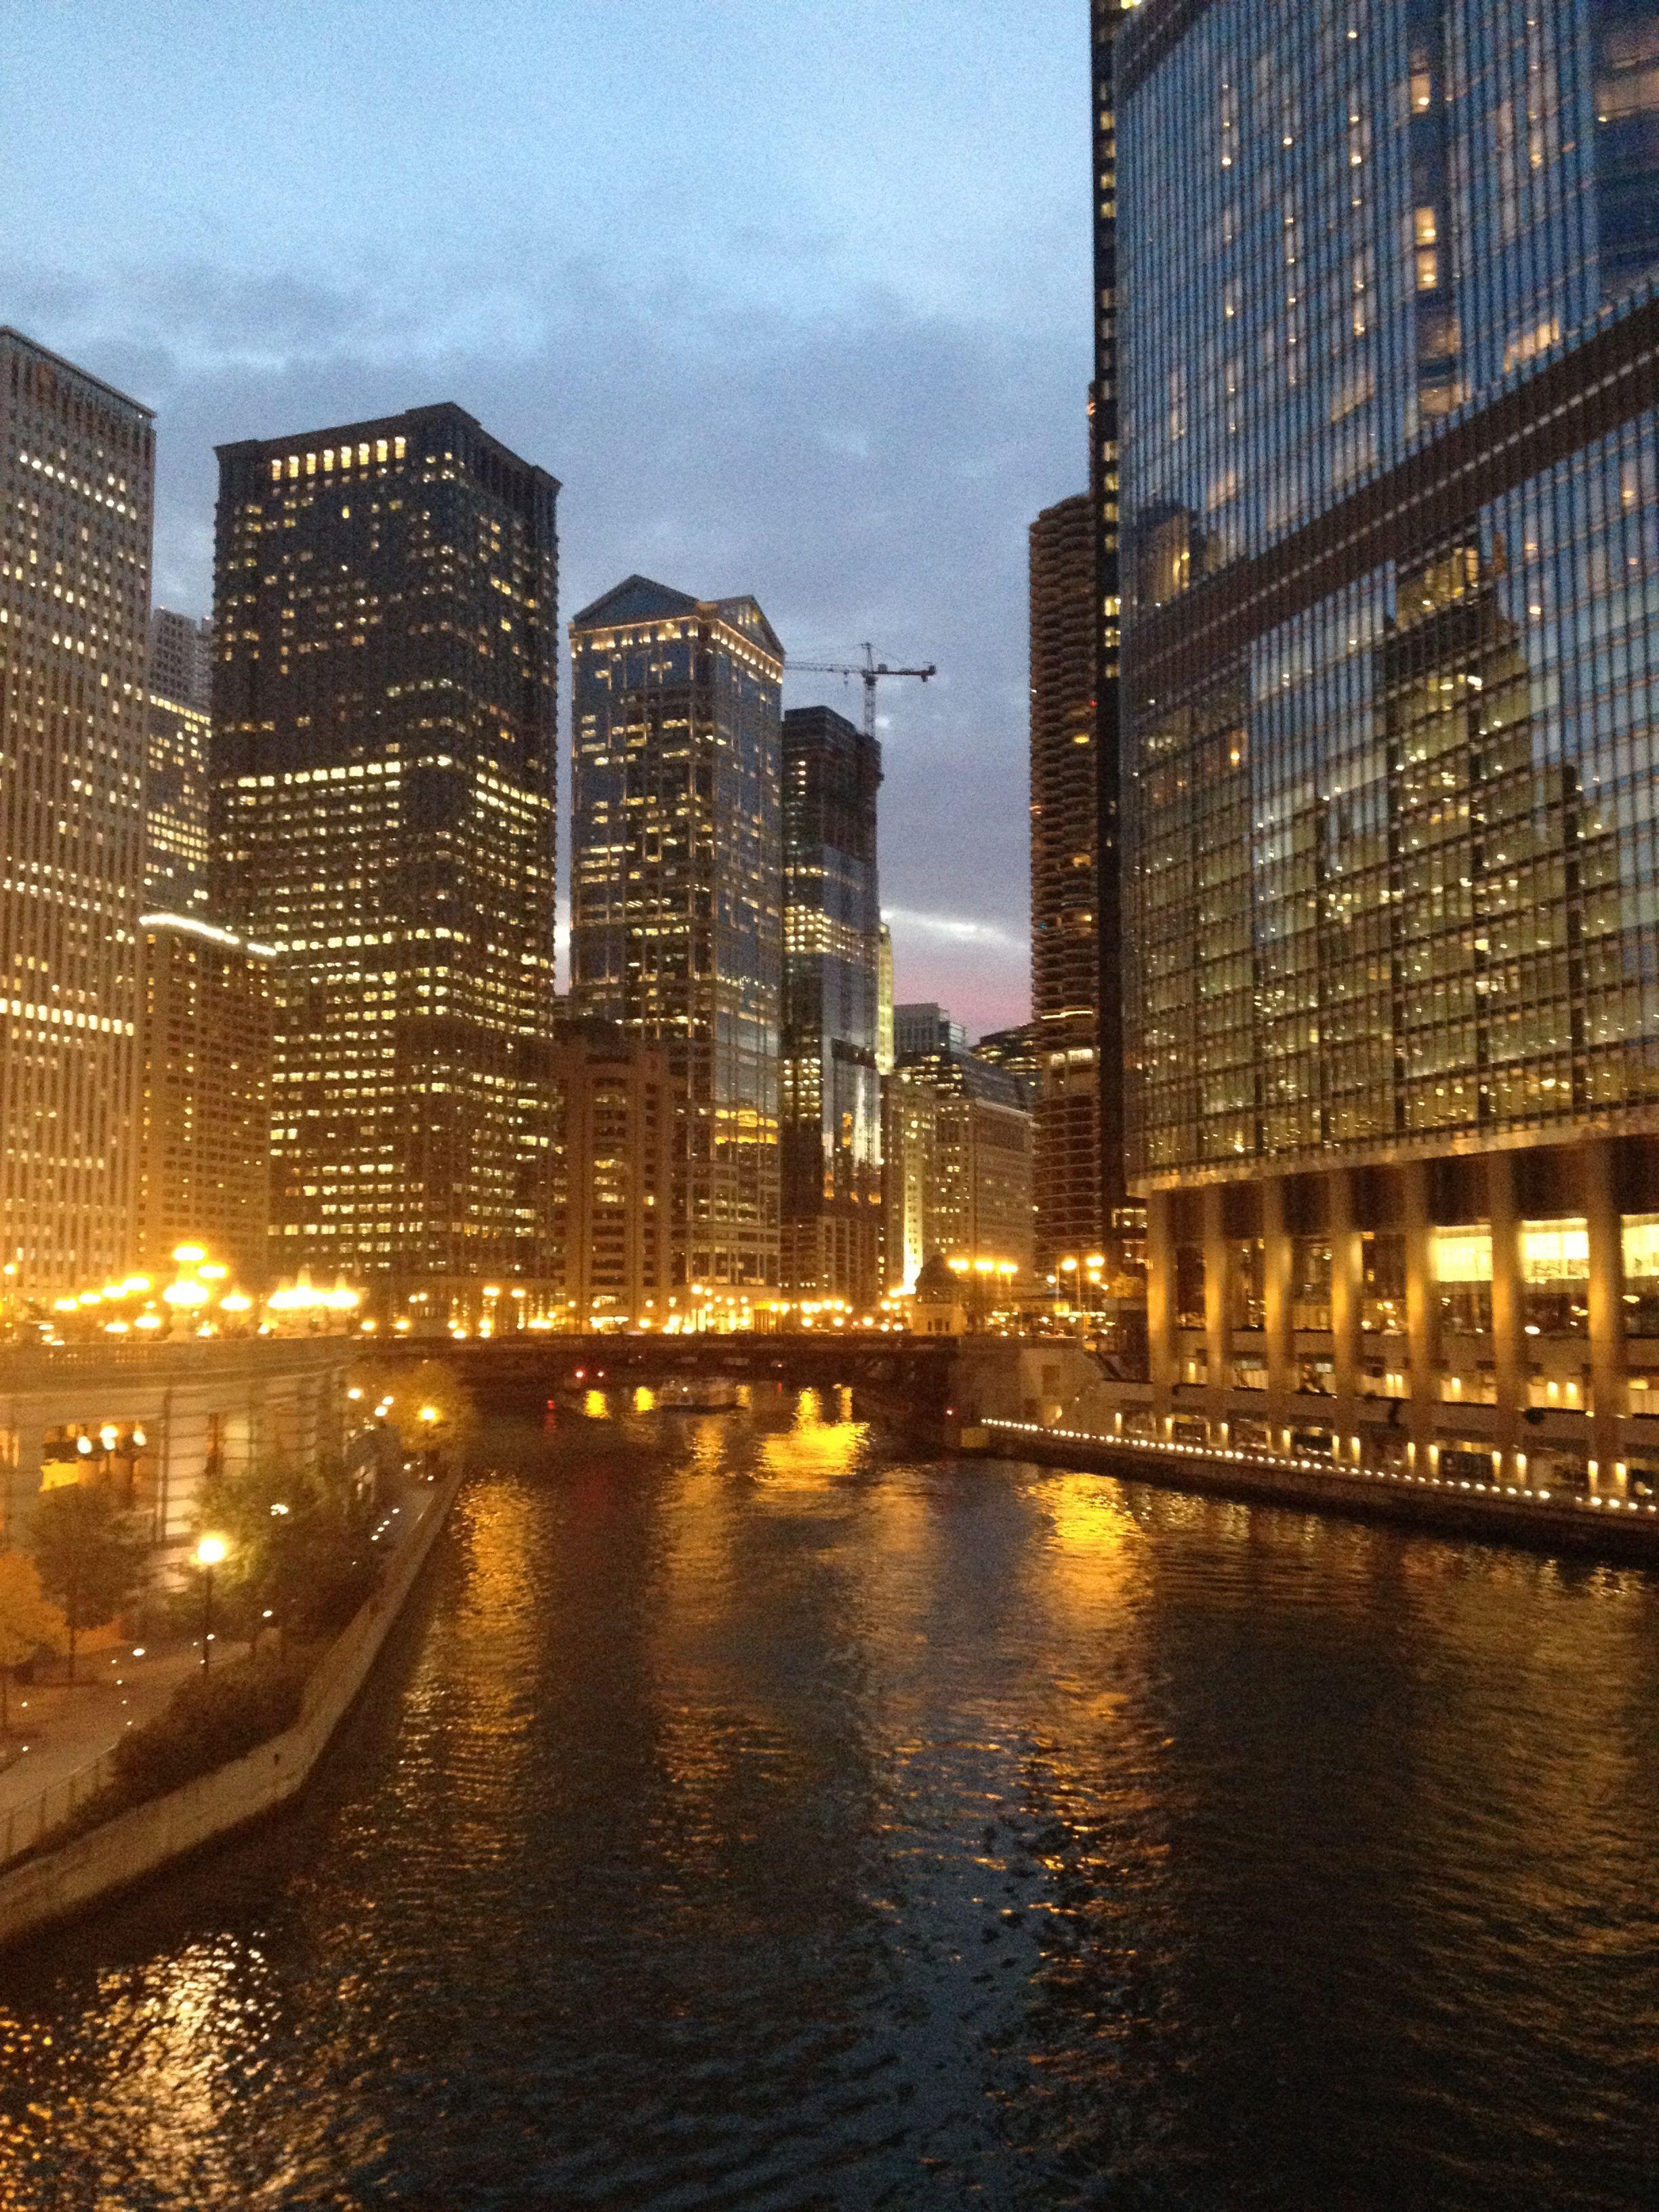 Chicago Chicago city, Chicago usa, Chicago illinois